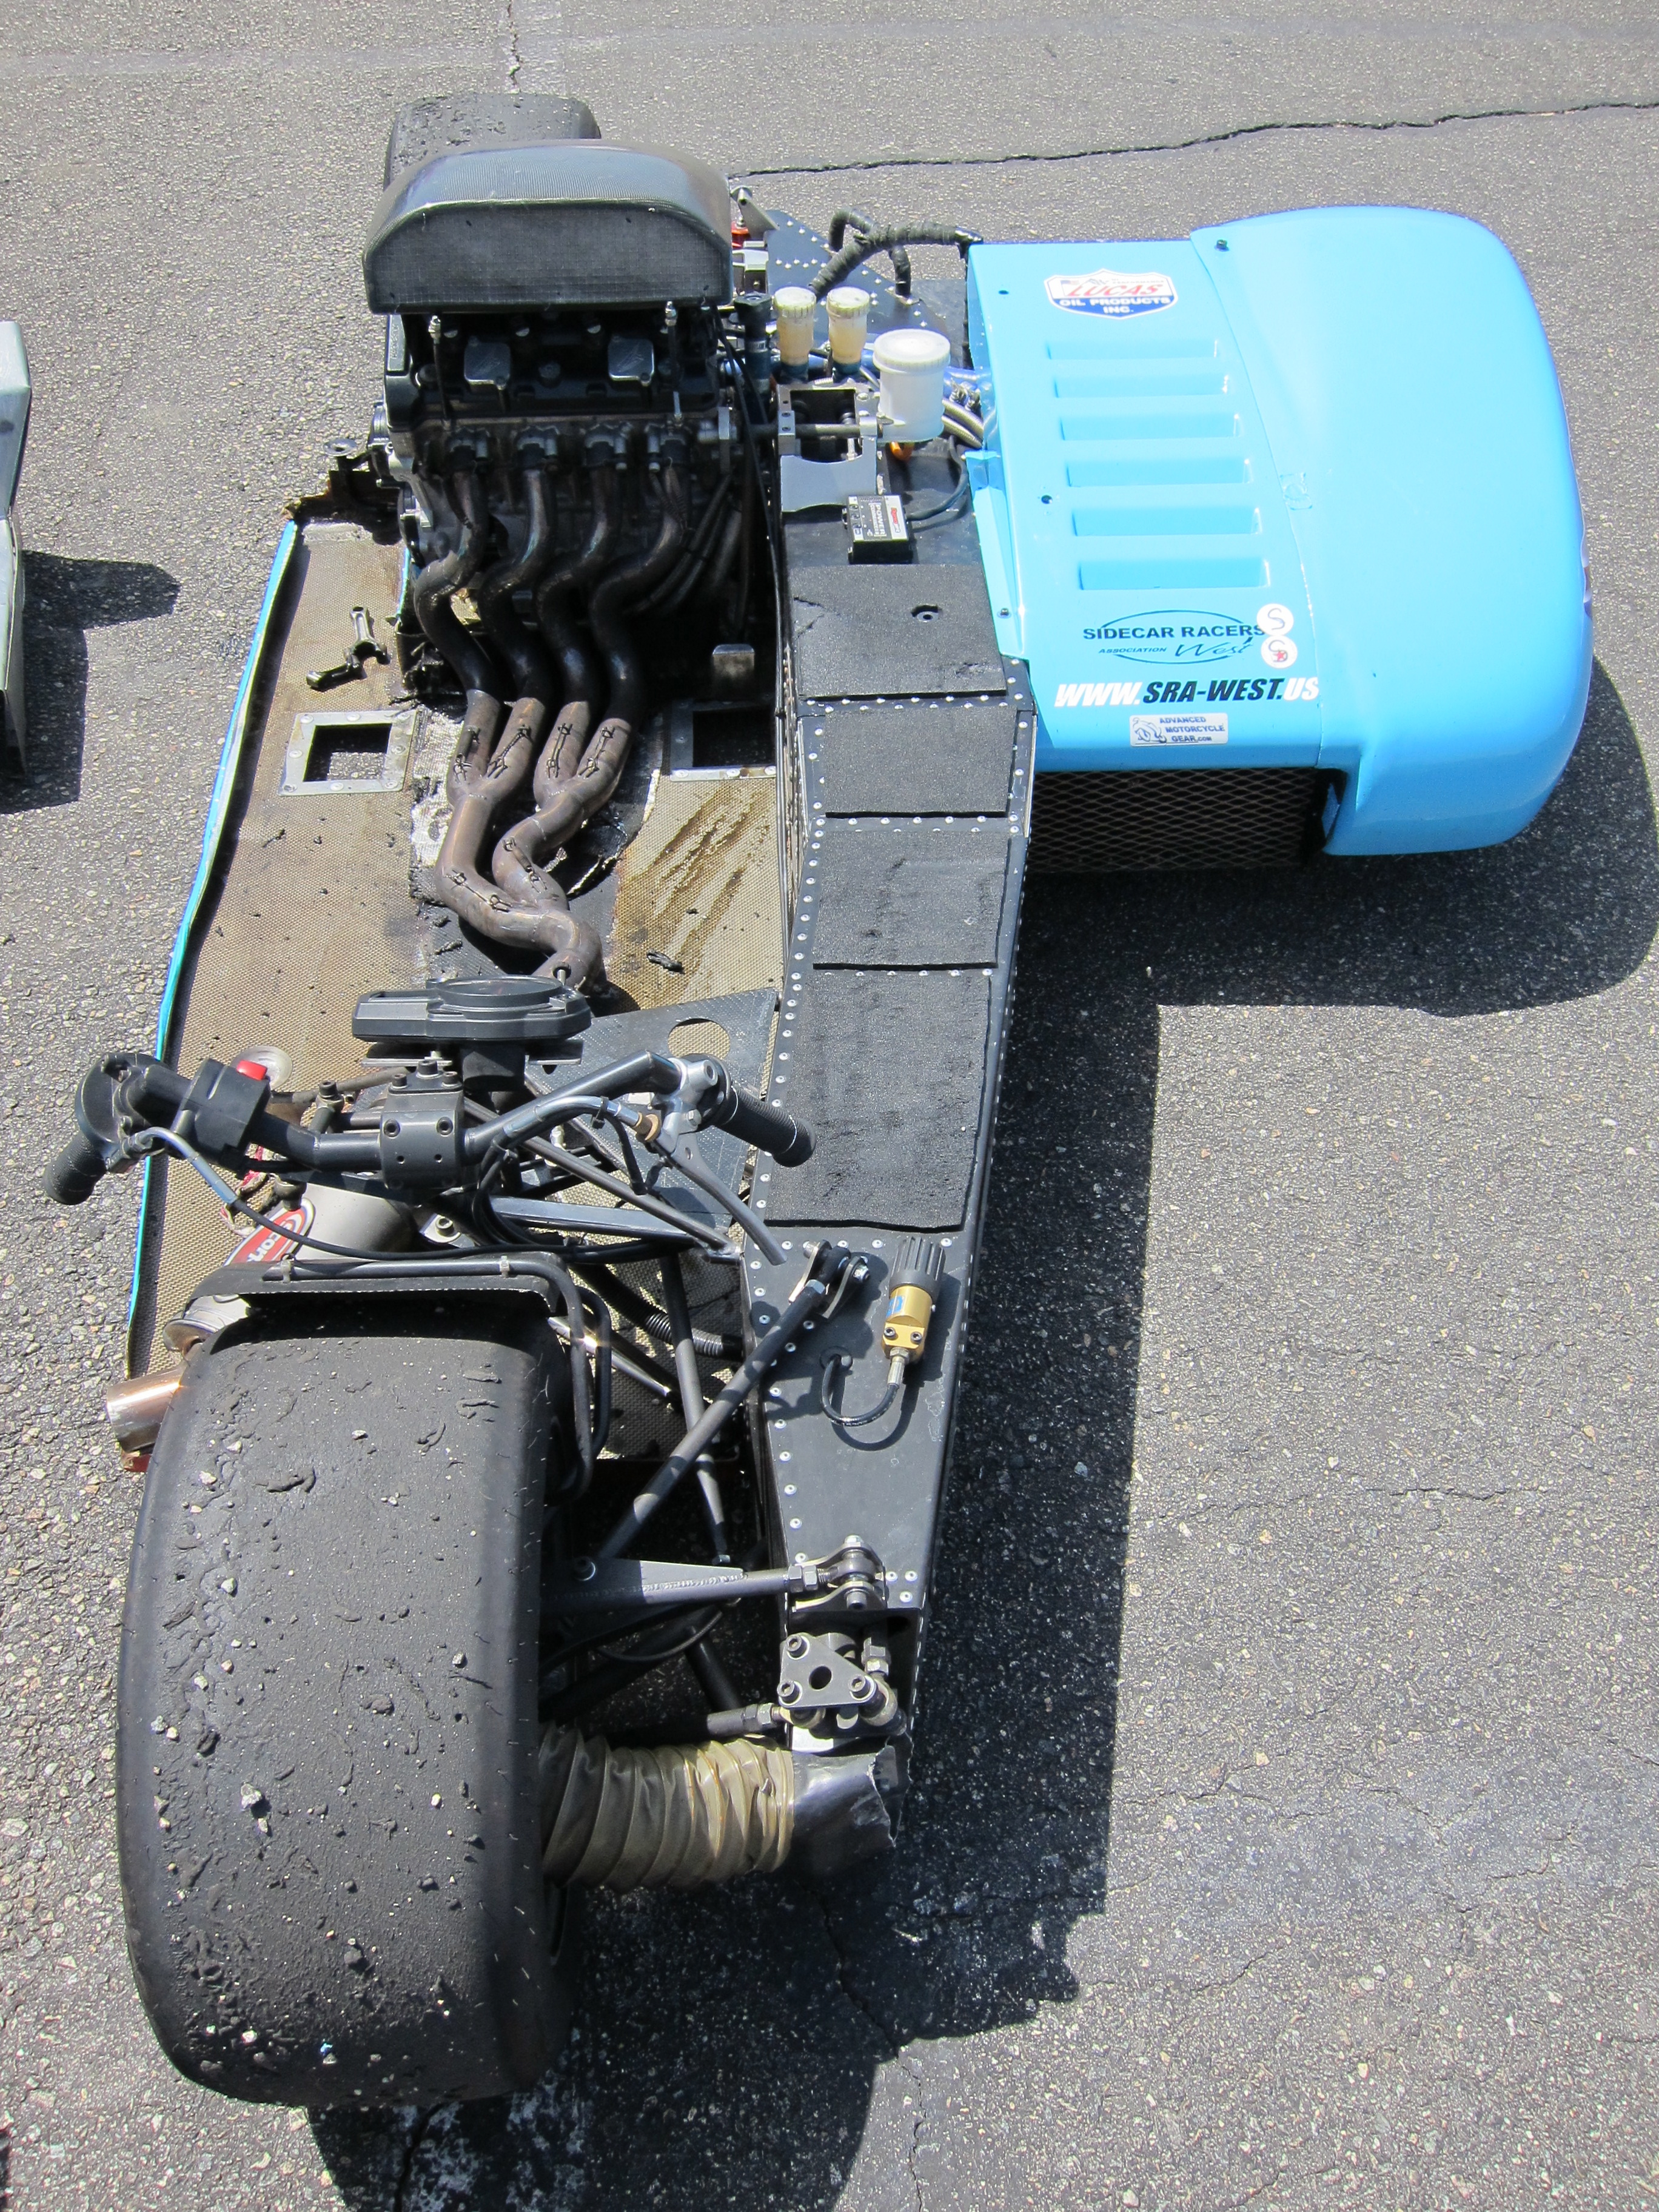 File:Modern racing sidecar (without fairing) jpg - Wikimedia